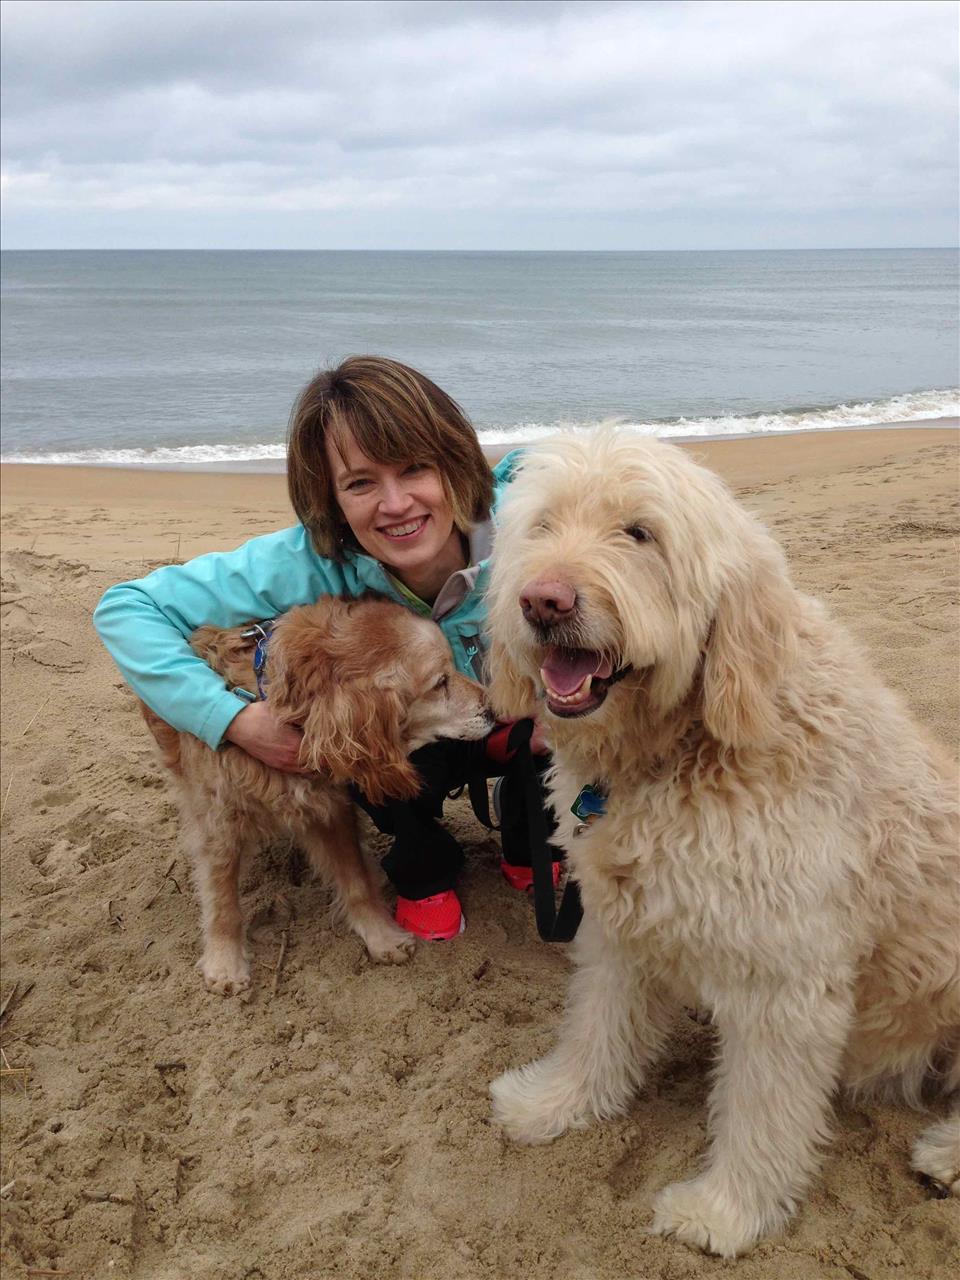 March 2015 Stay - DU200 - Beach Daze, Susan Daylida